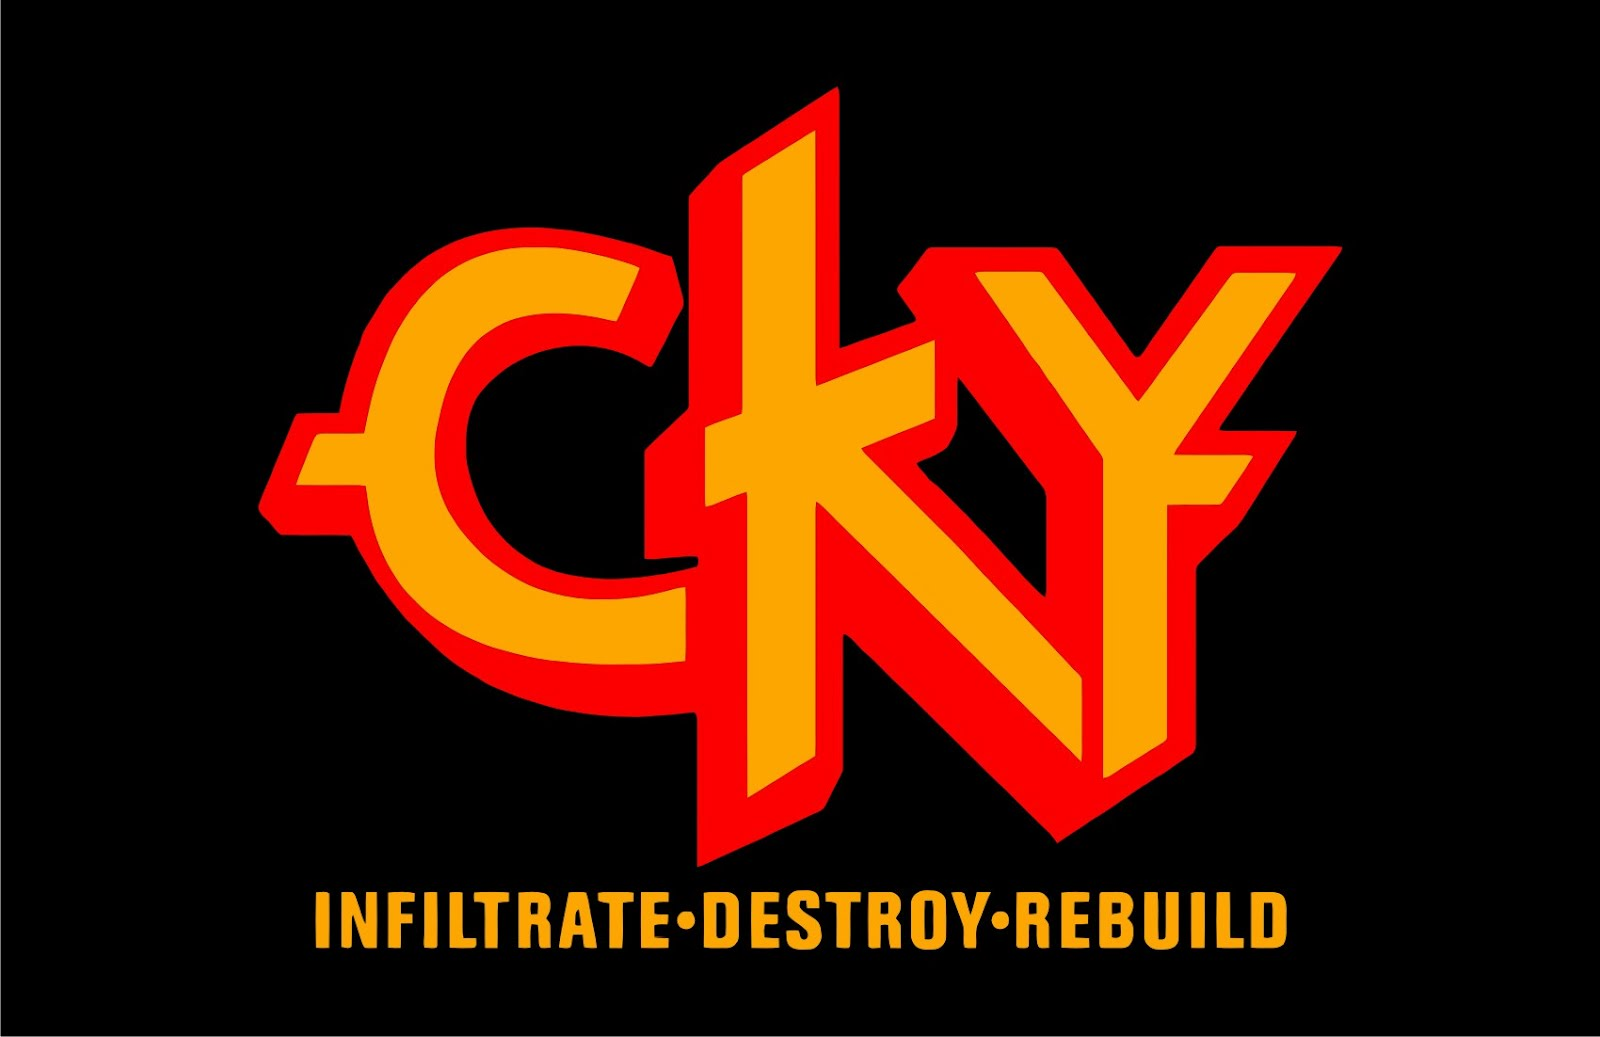 cky-infiltrate_destroy_rebuild_front_vector